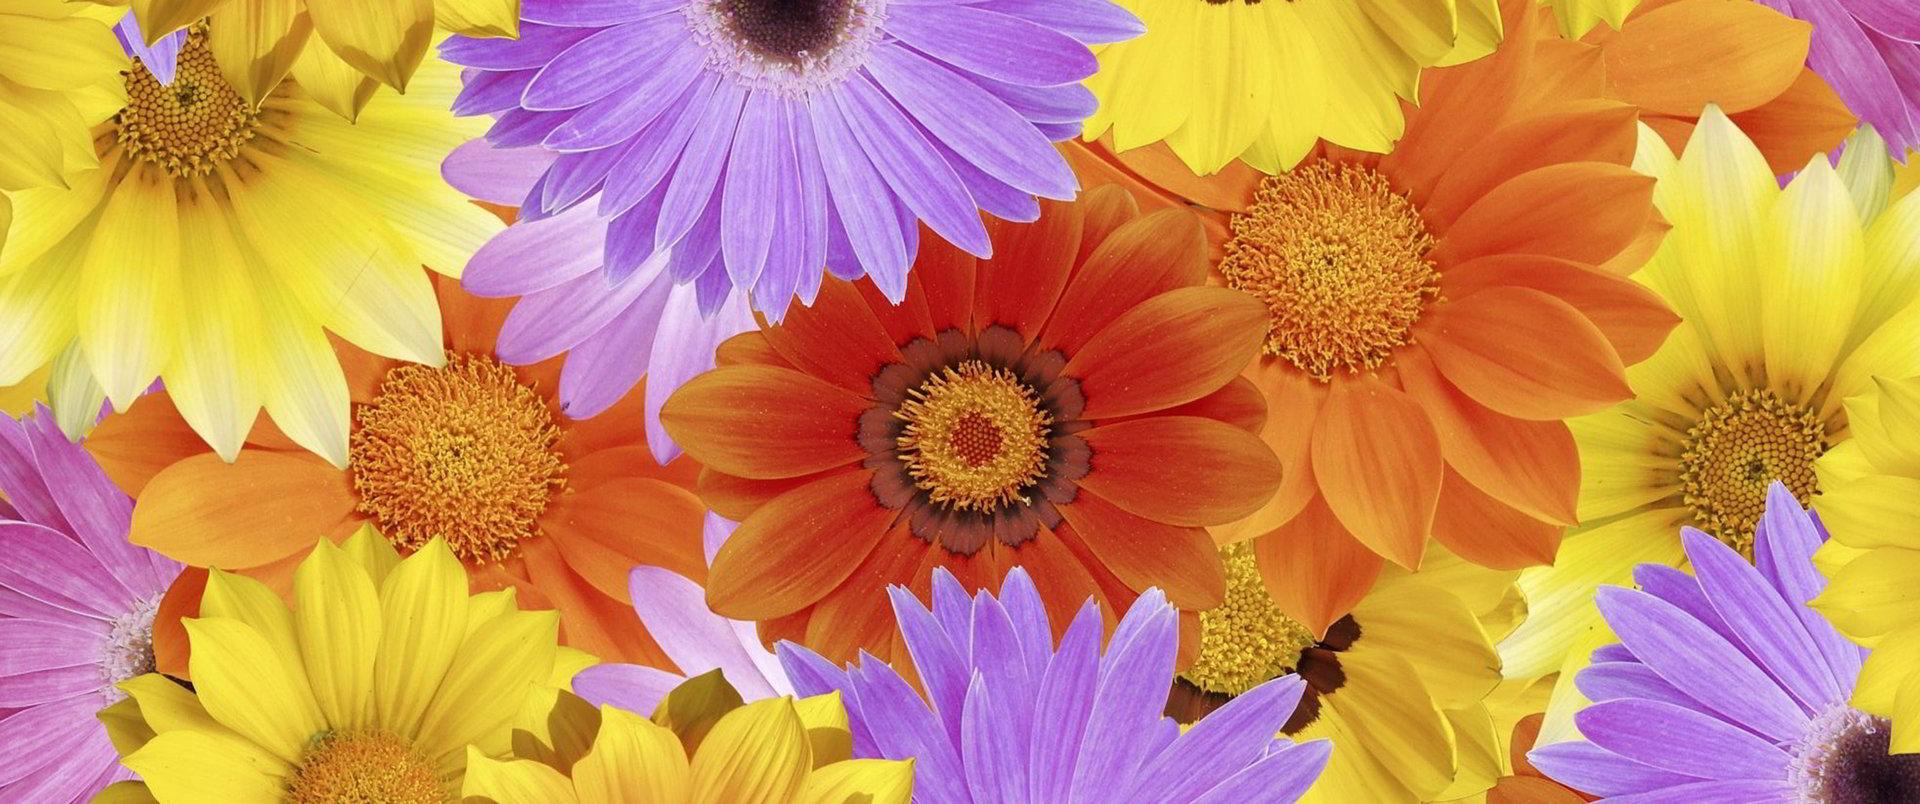 hinh anh hoa cuc dep 52